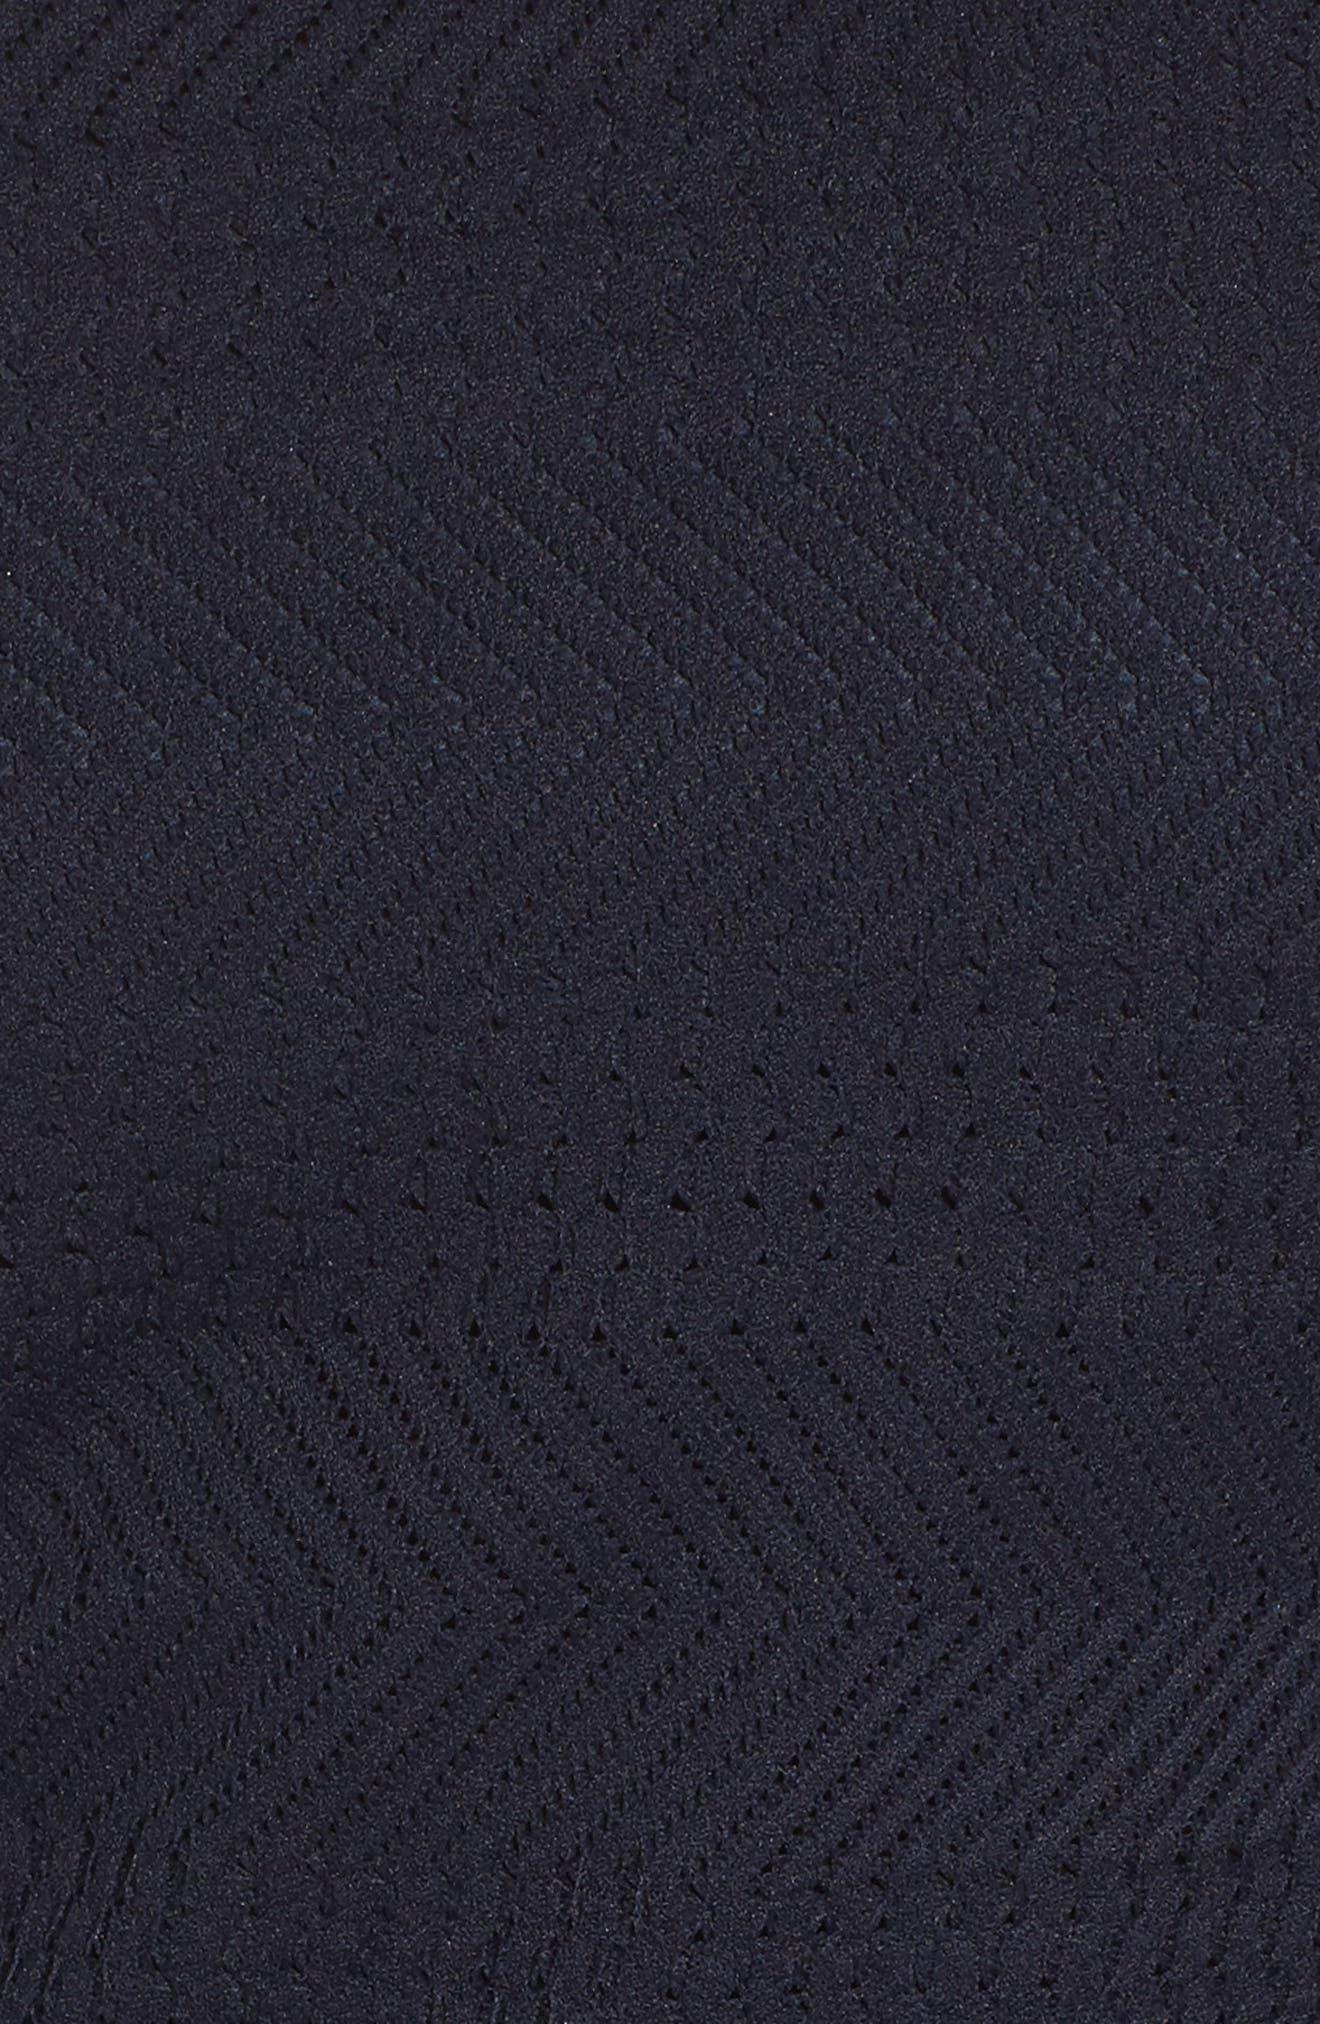 Solid Herringbone Knit Dress,                             Alternate thumbnail 5, color,                             Navy